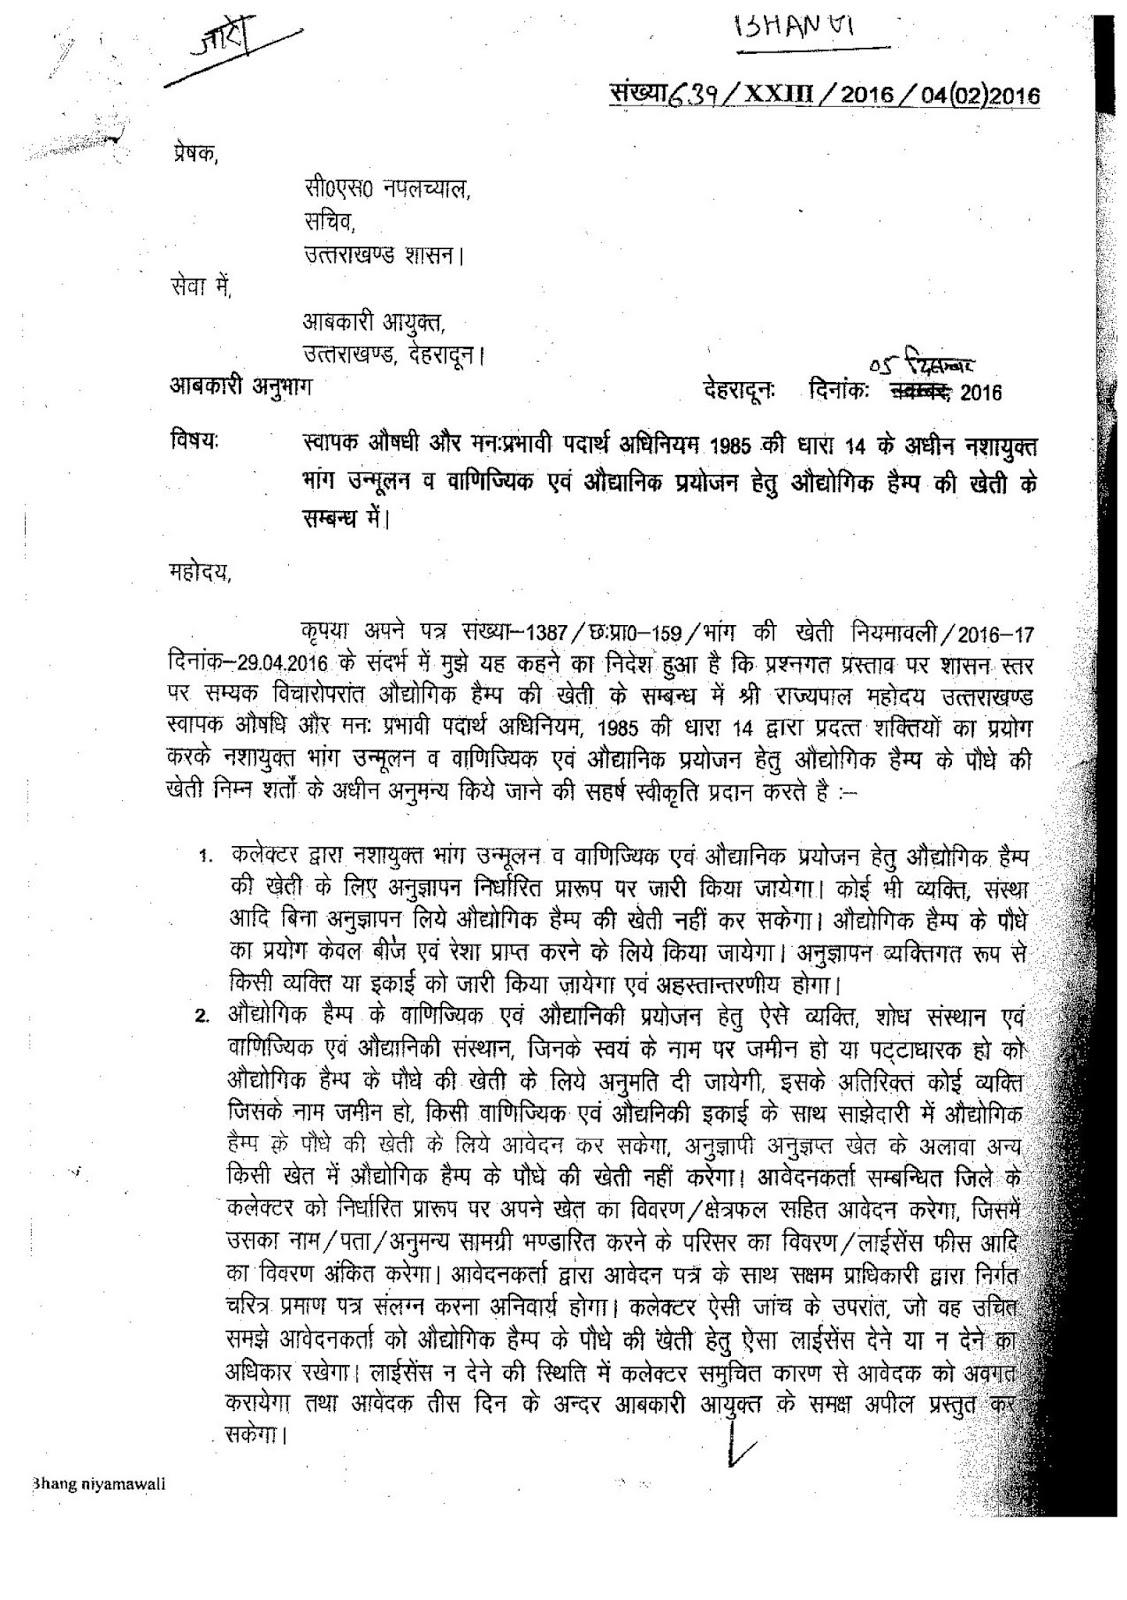 hemp notification introduction for hemp by uttarakhand govt